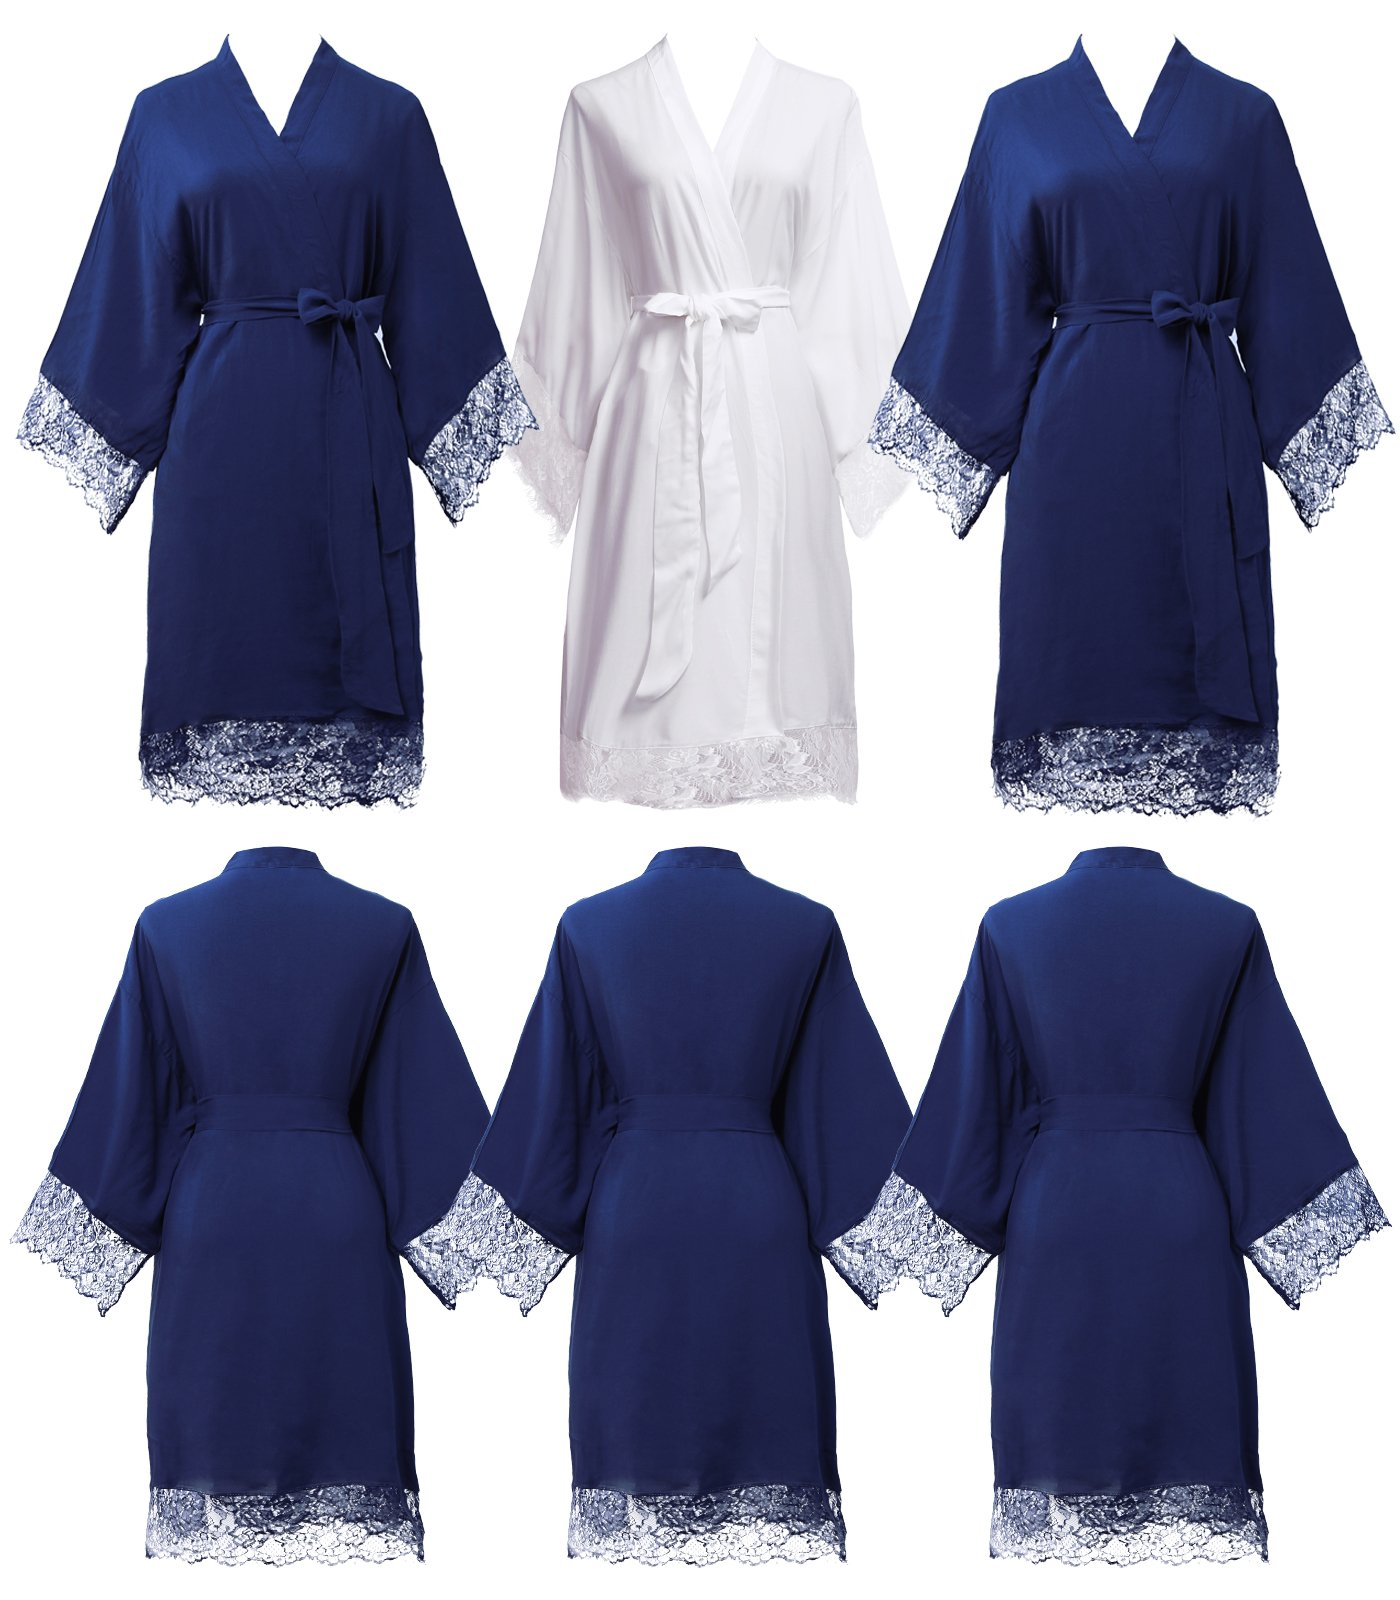 PROGULOVER set of 3-6 Women's Imitation Cotton Wedding Robes for Bride and Bridesmaid Wedding Party Kimono Robes short